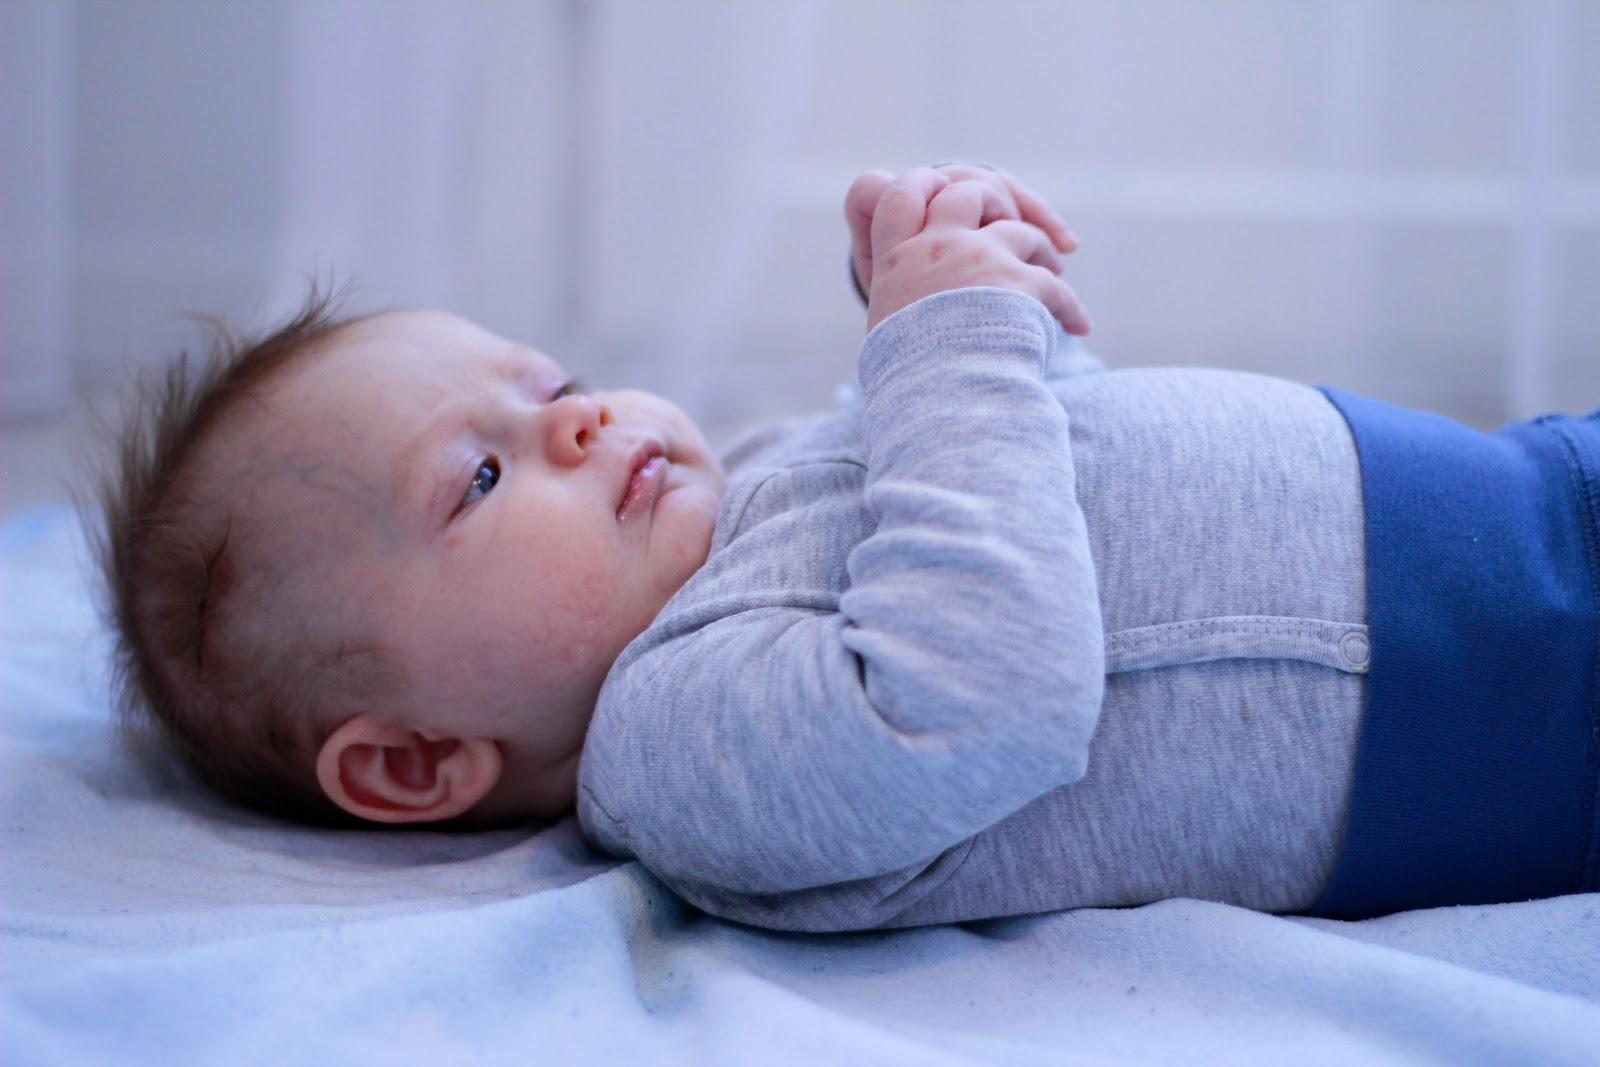 Vauva 3 kk kehitys